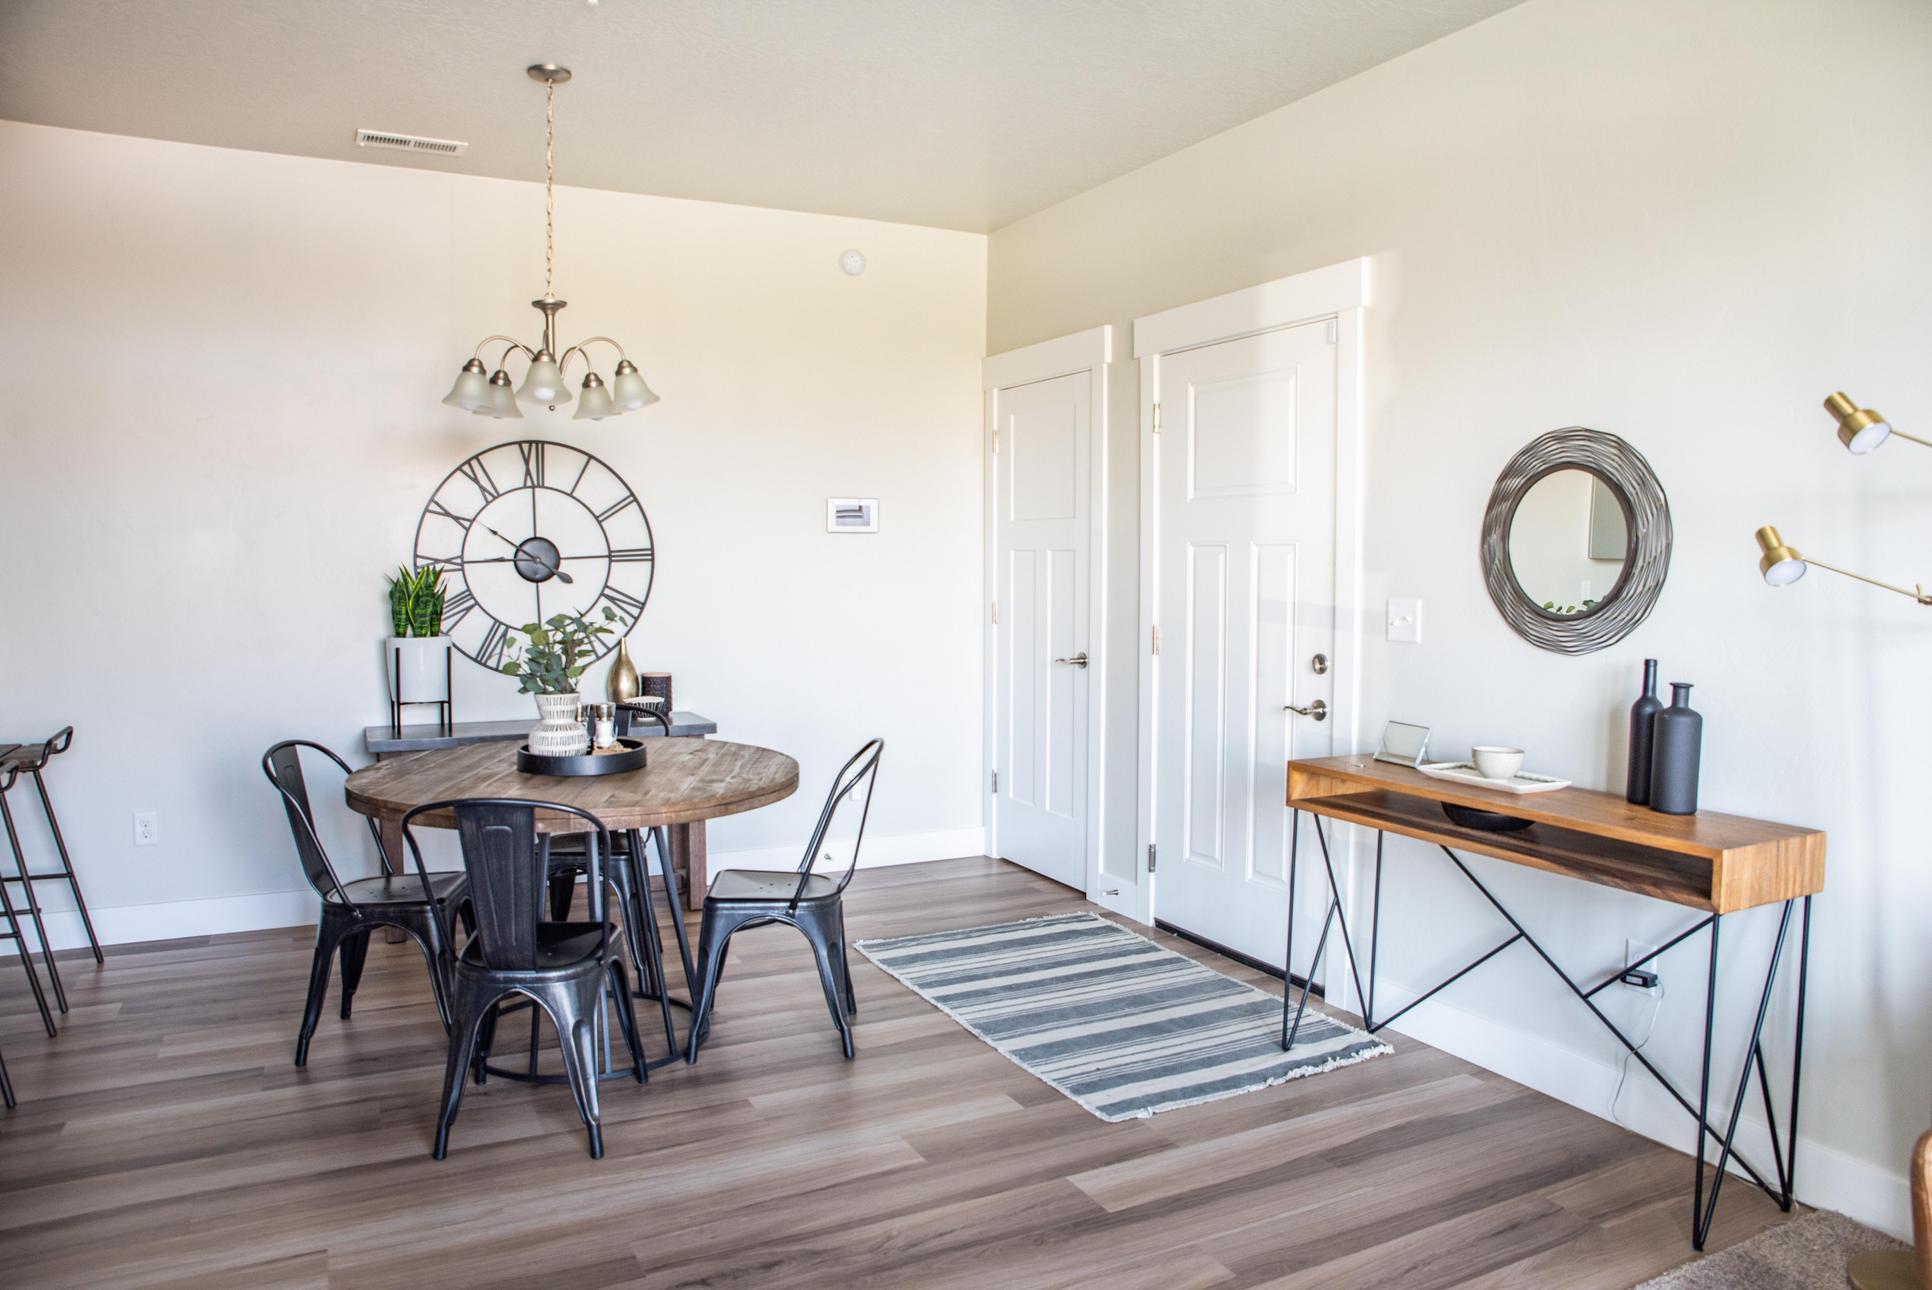 Condominium Main Level:Dining Room and Entry